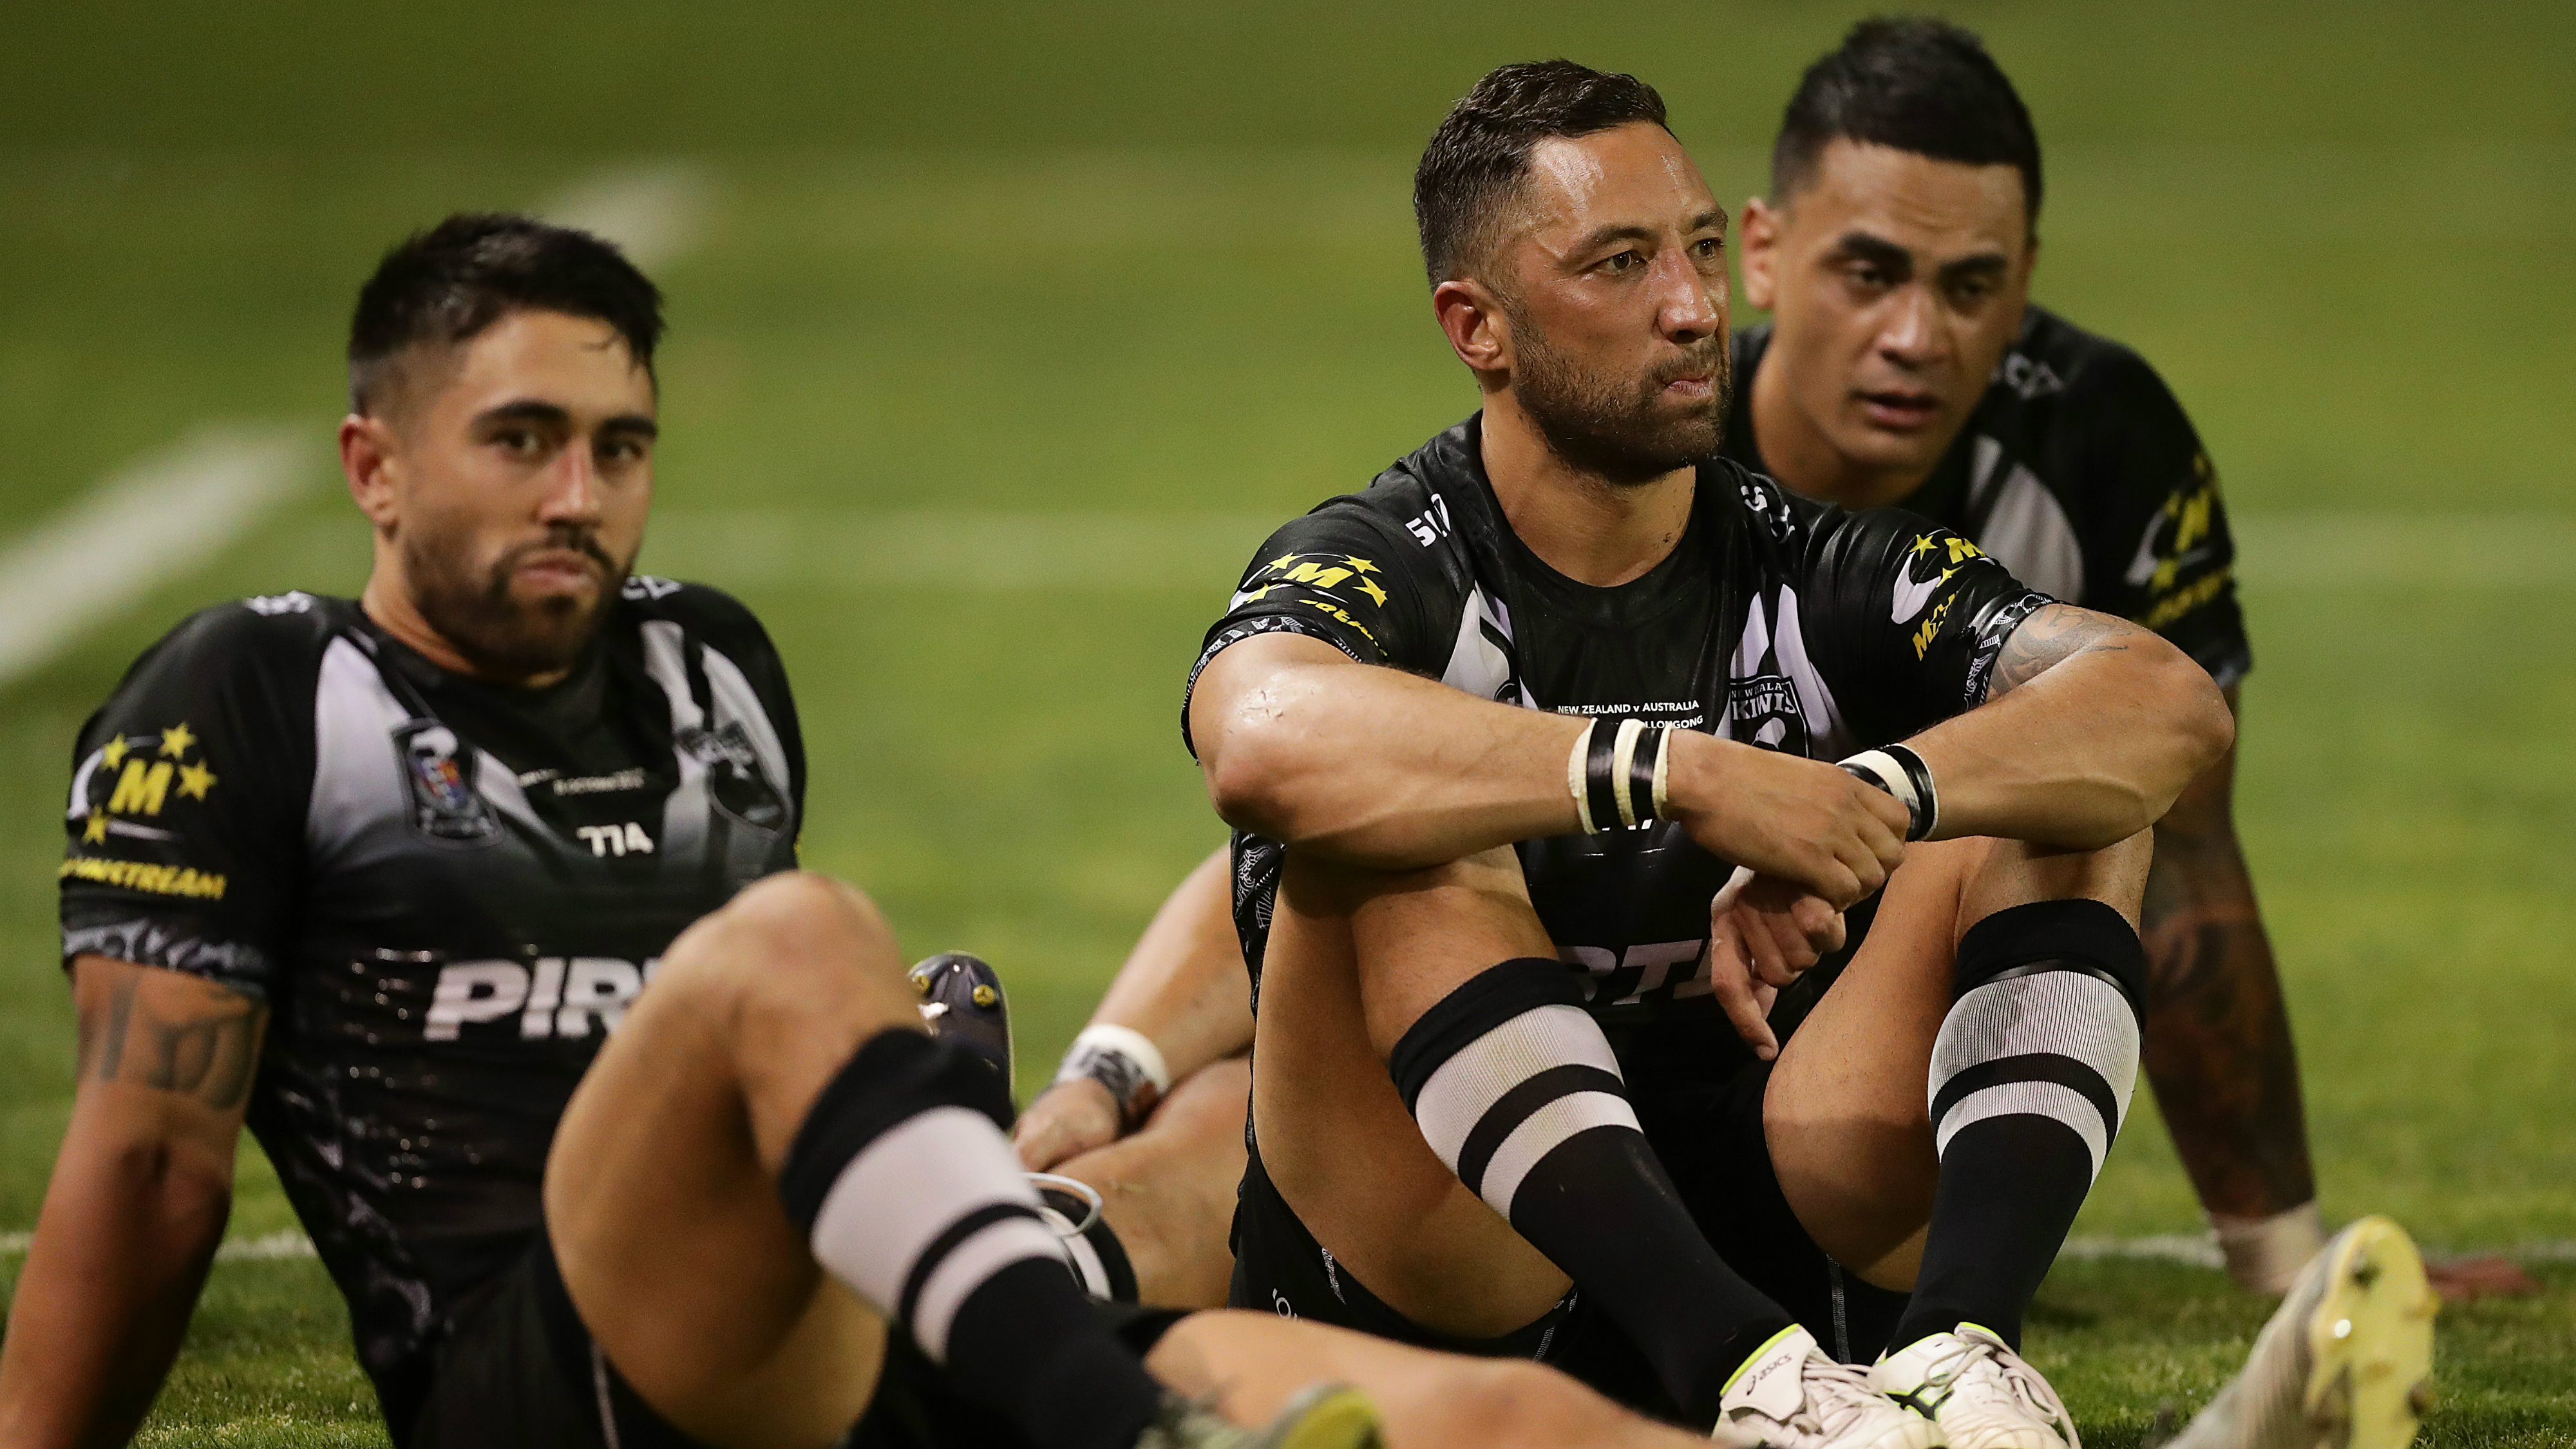 New Zealand captain Benji Marshall and coach Michael Maguire respond to rumours around star player's Kiwis future